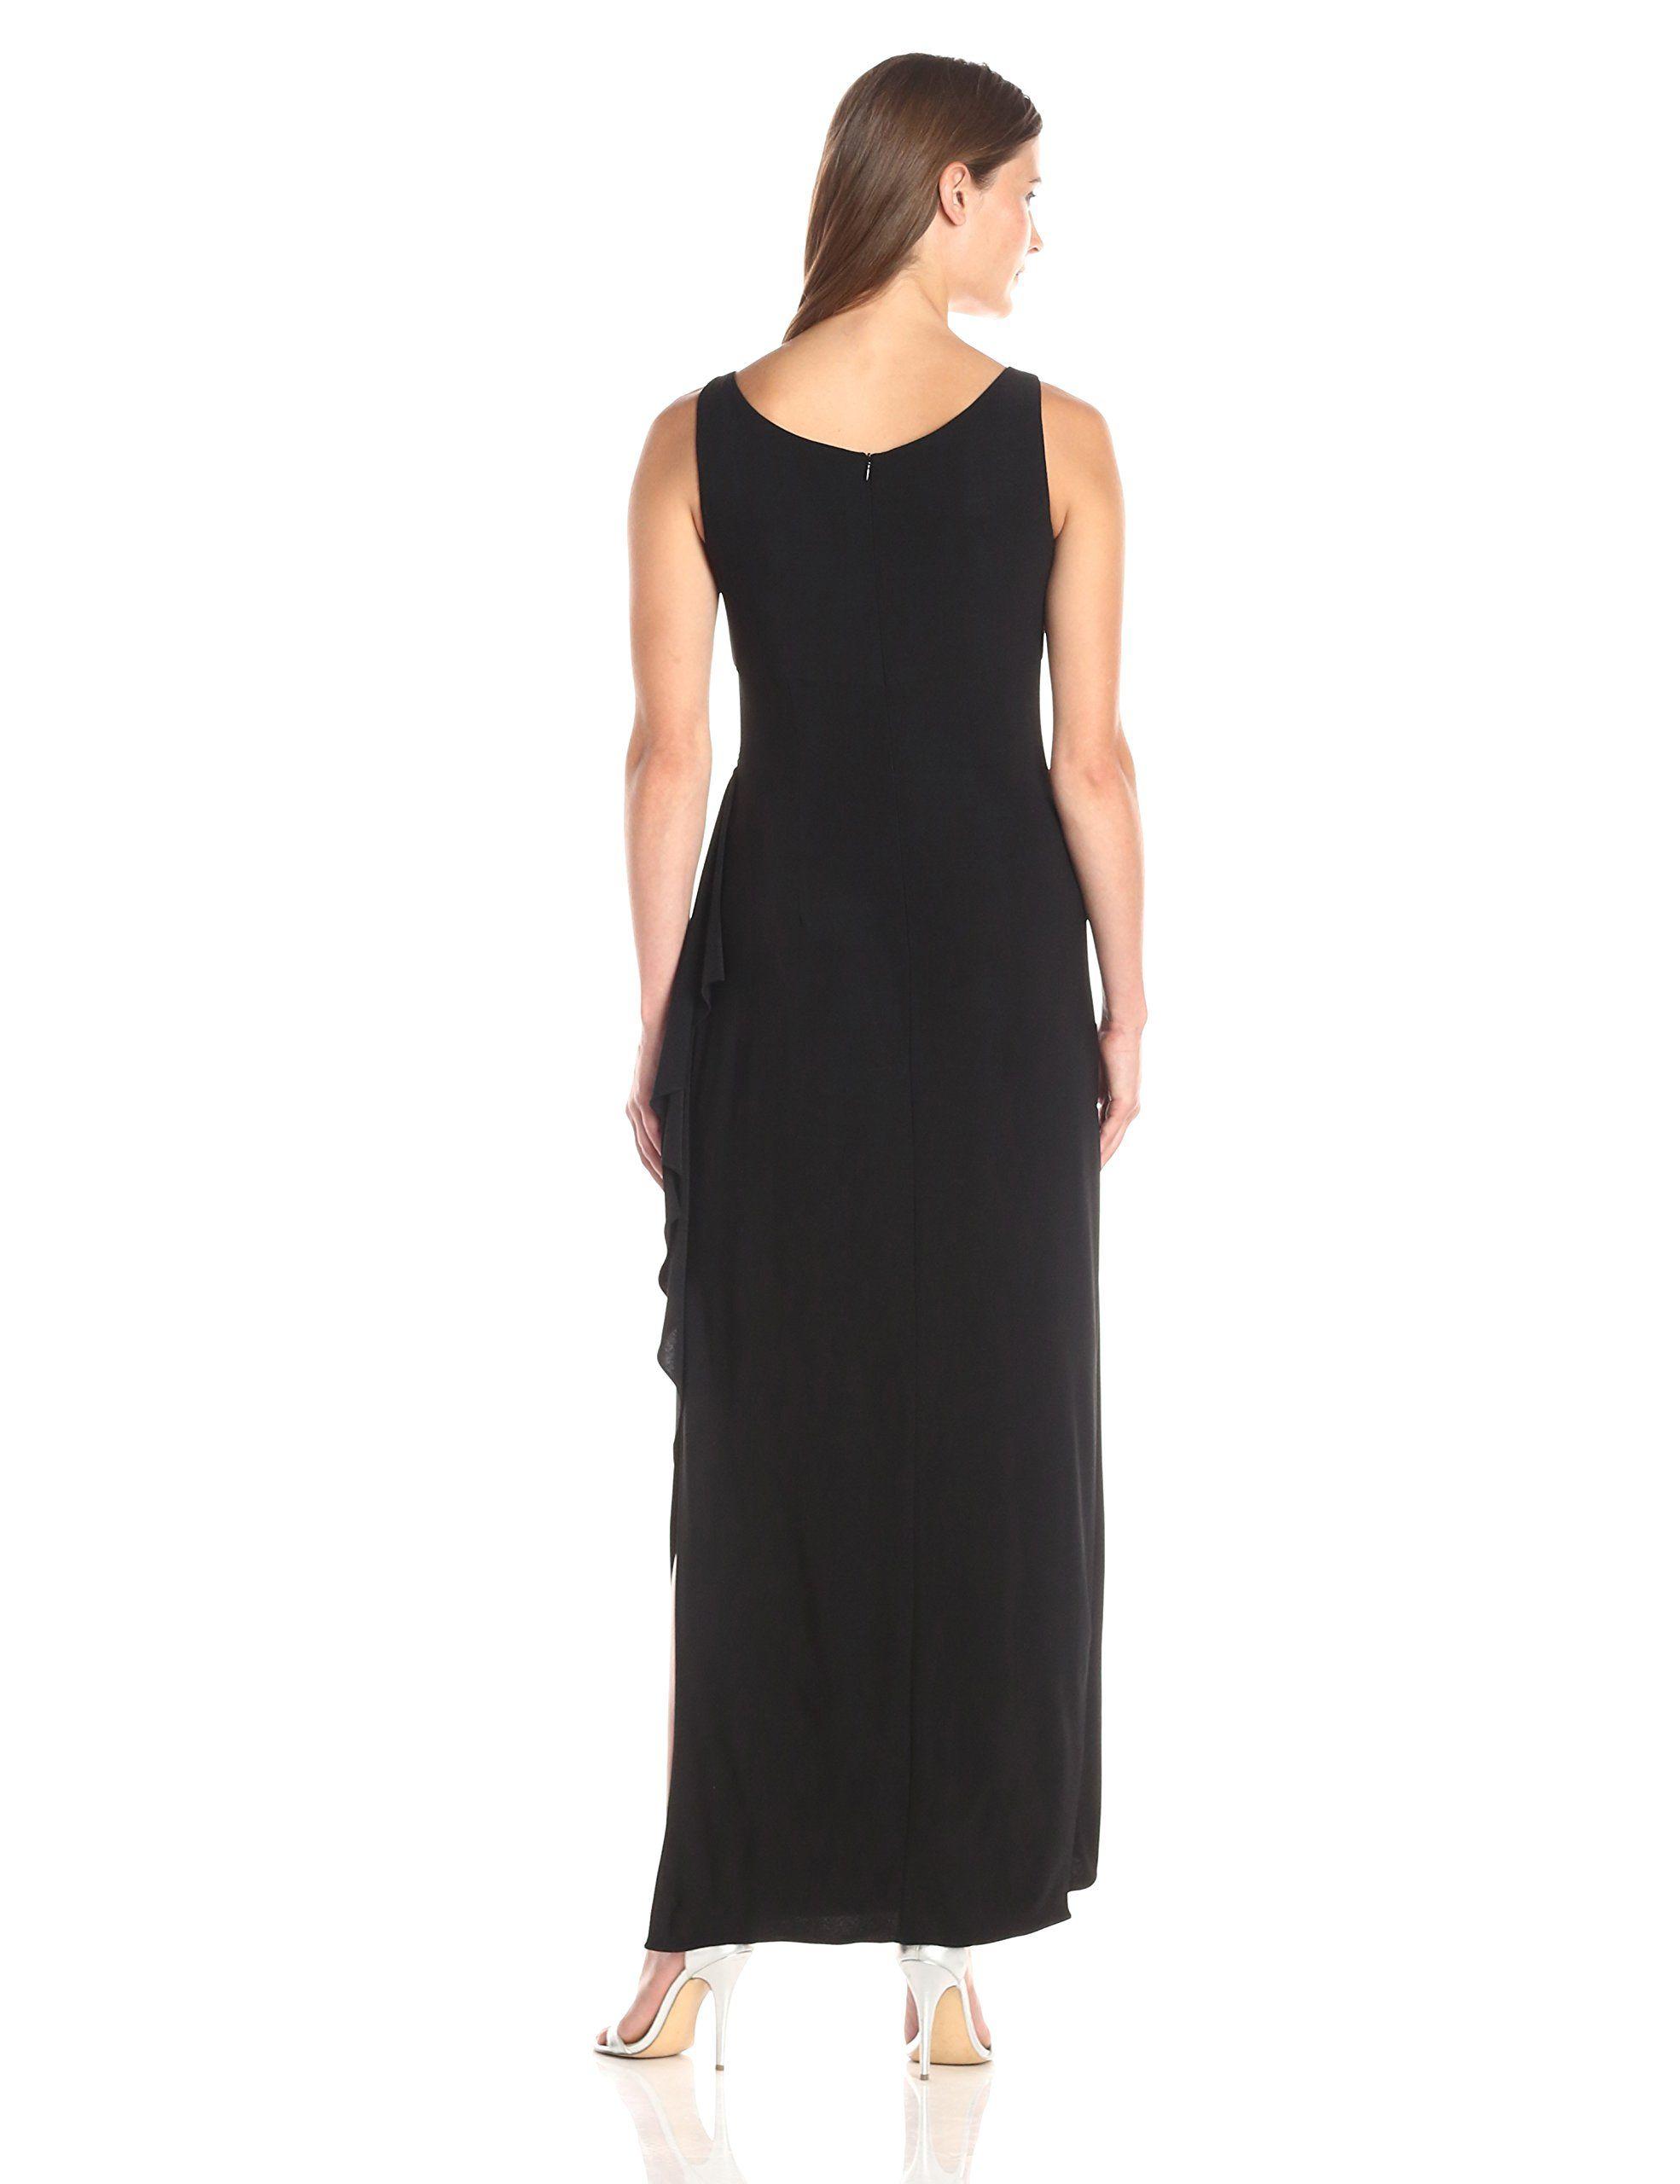 ff5d4a03 Alex Evening Dress With Bolero Jacket